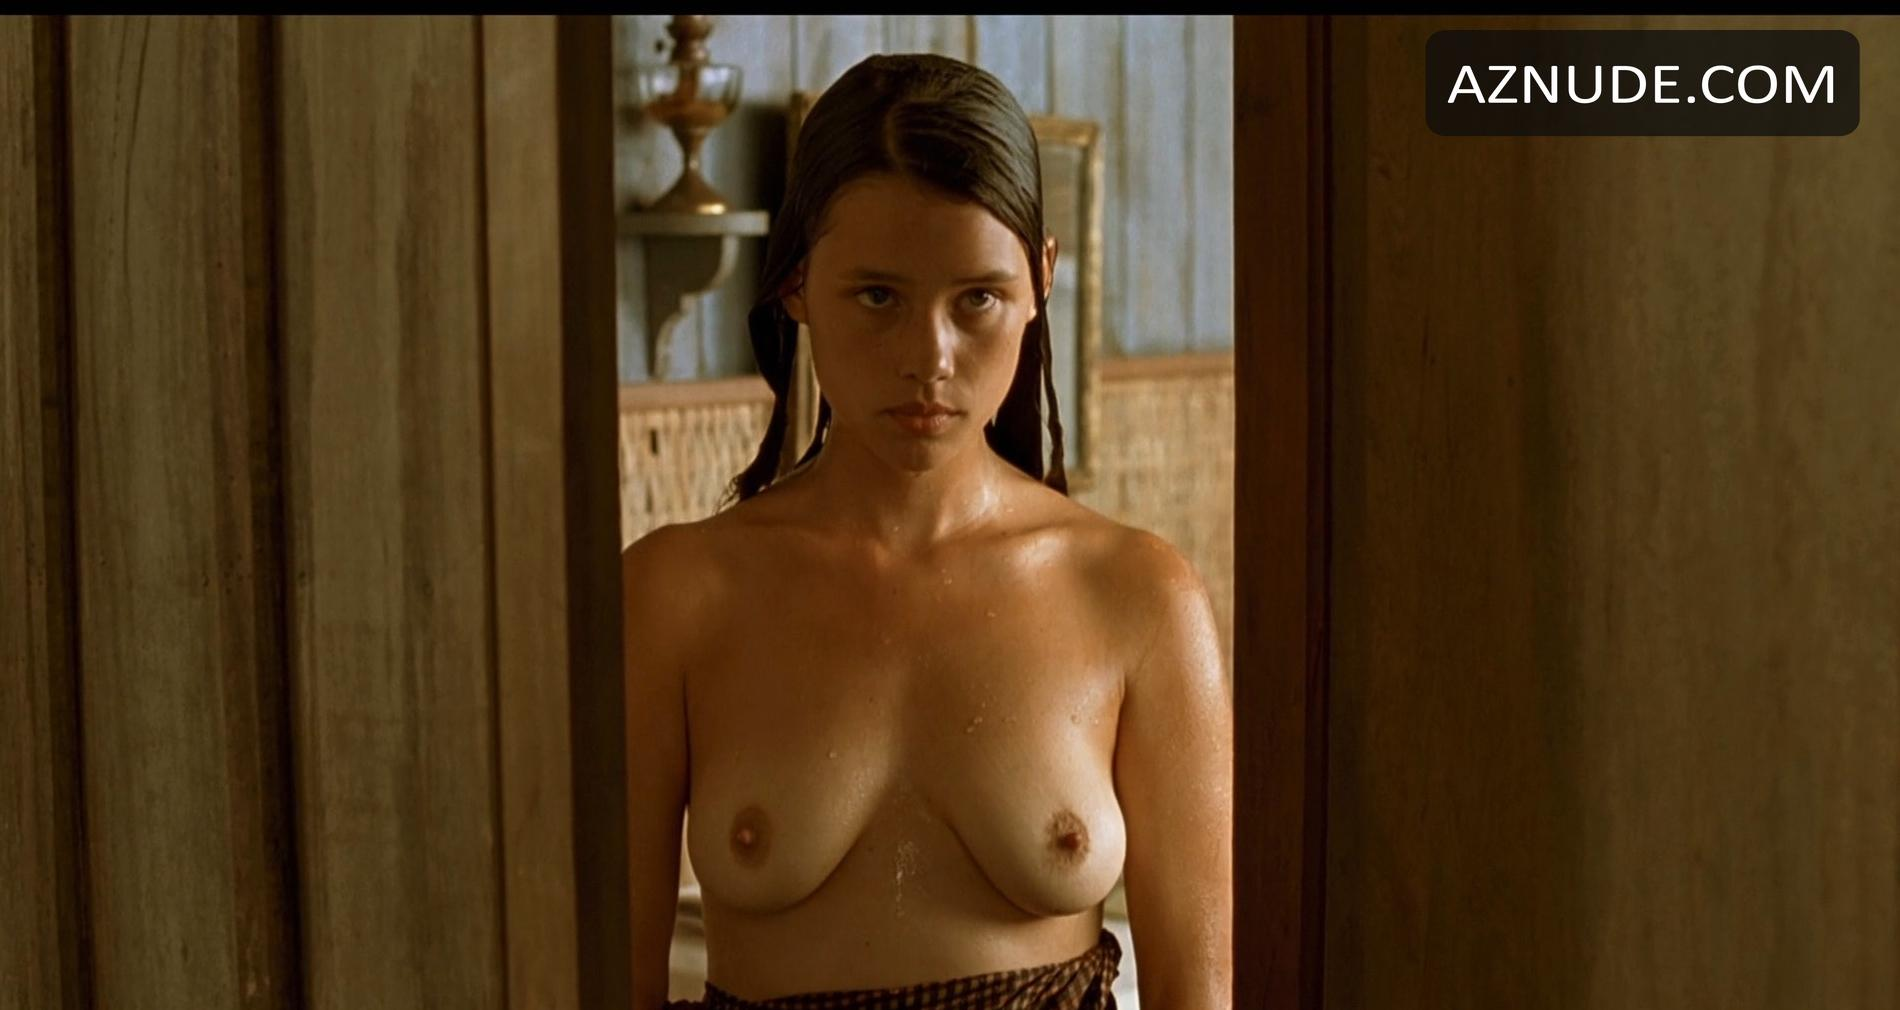 Angelina jolie nude tits in 039foxfire039 on scandalplanetcom - 1 part 4